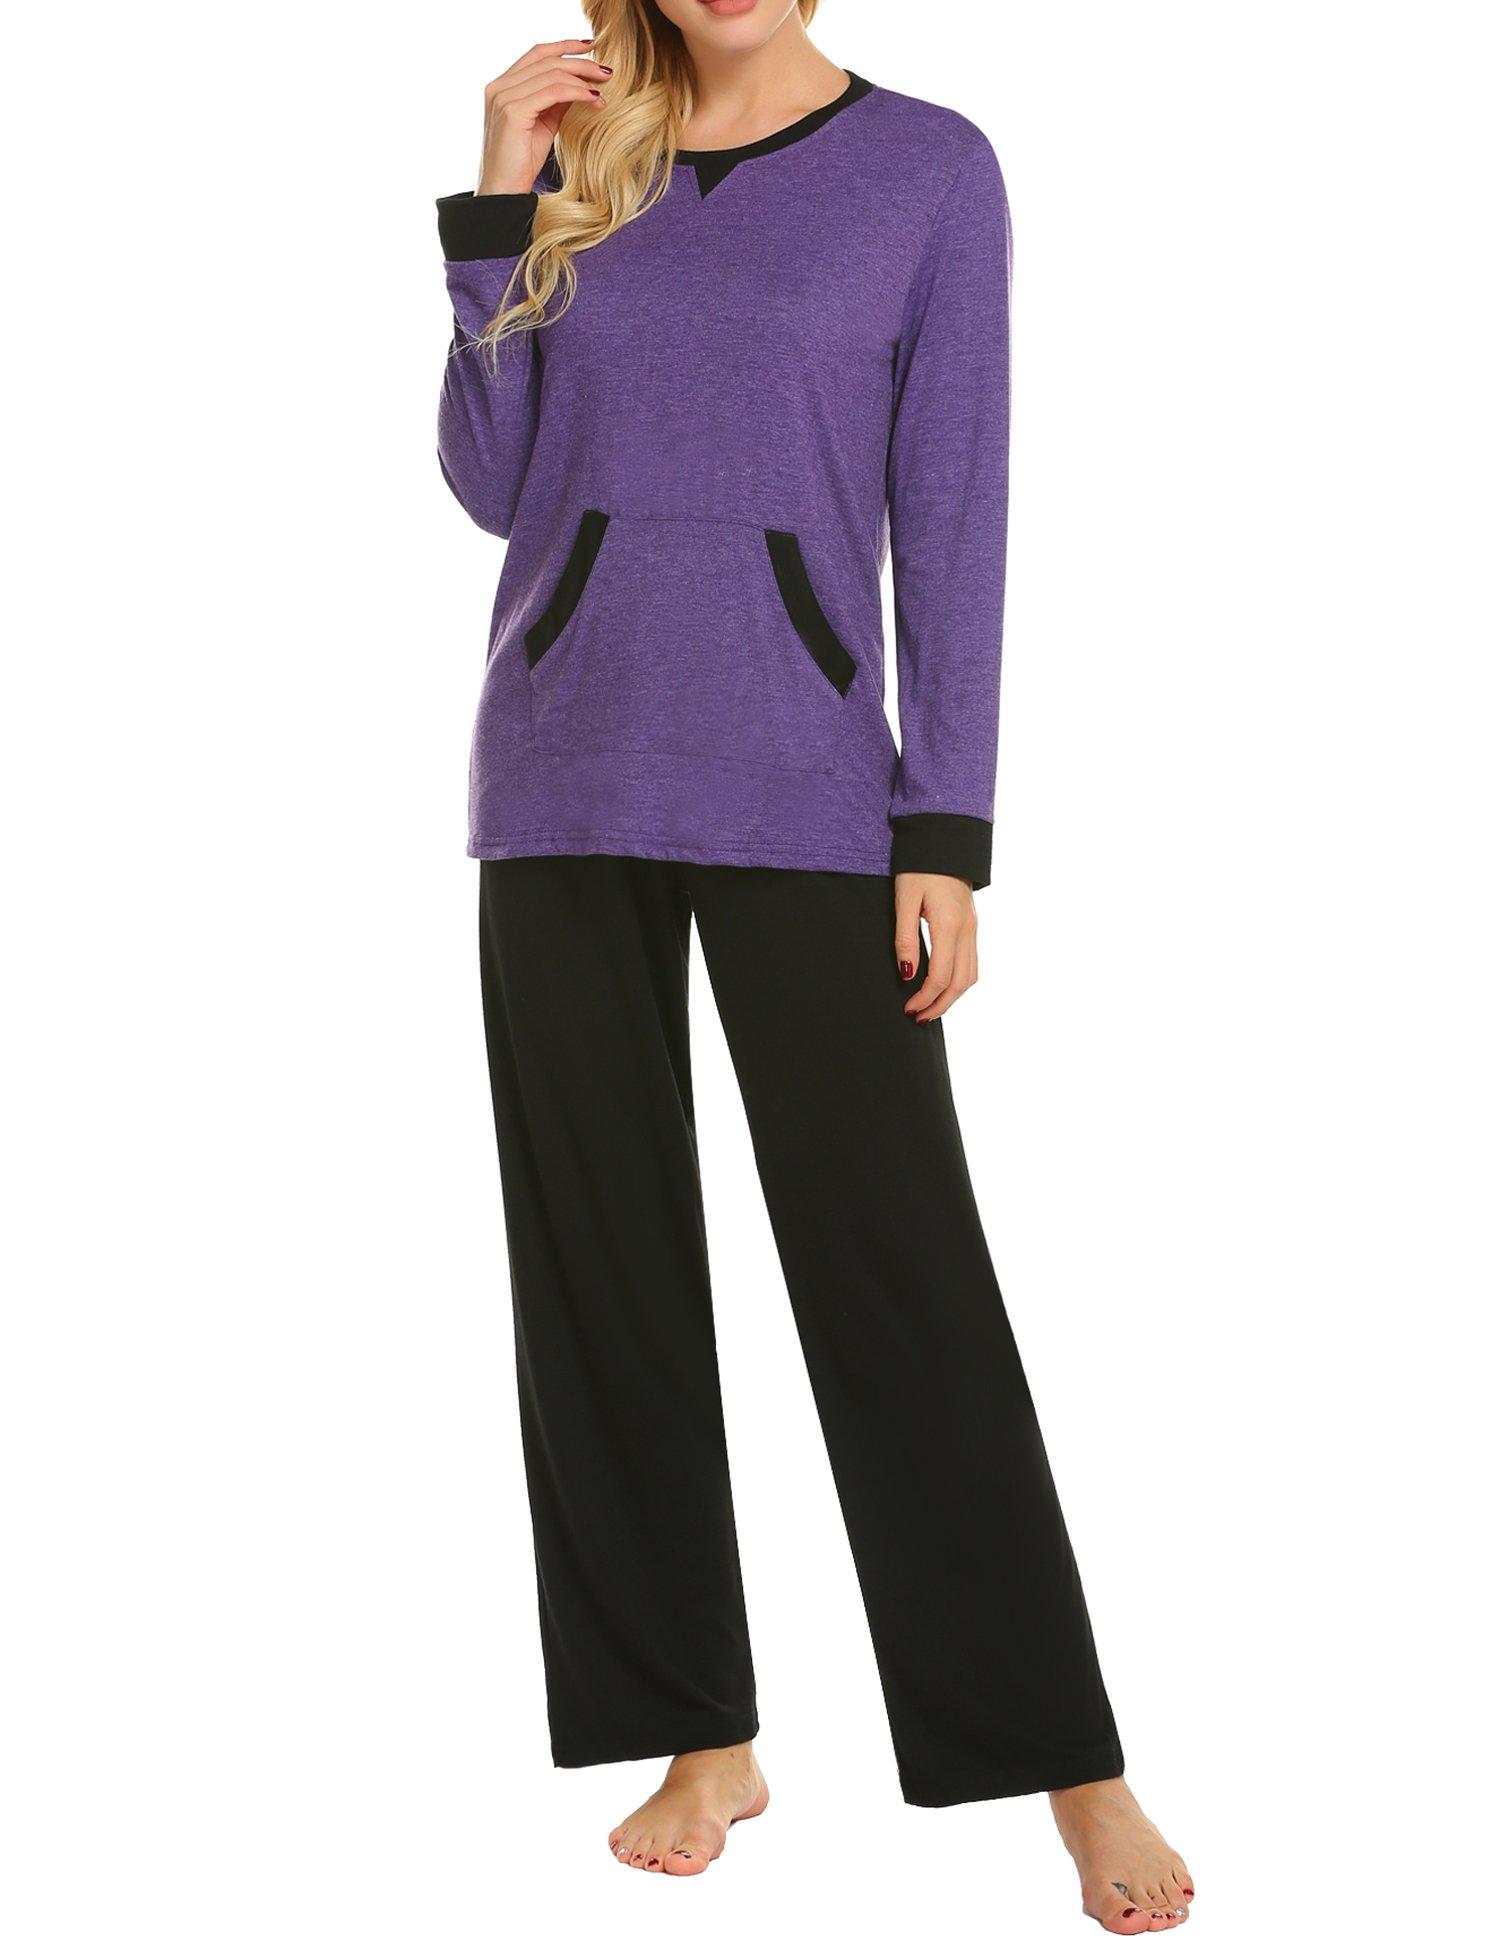 MAXMODA Soft Pajamas Long Sleeve Sleepwear Soft PJ Set with Pants Purple L by MAXMODA (Image #3)